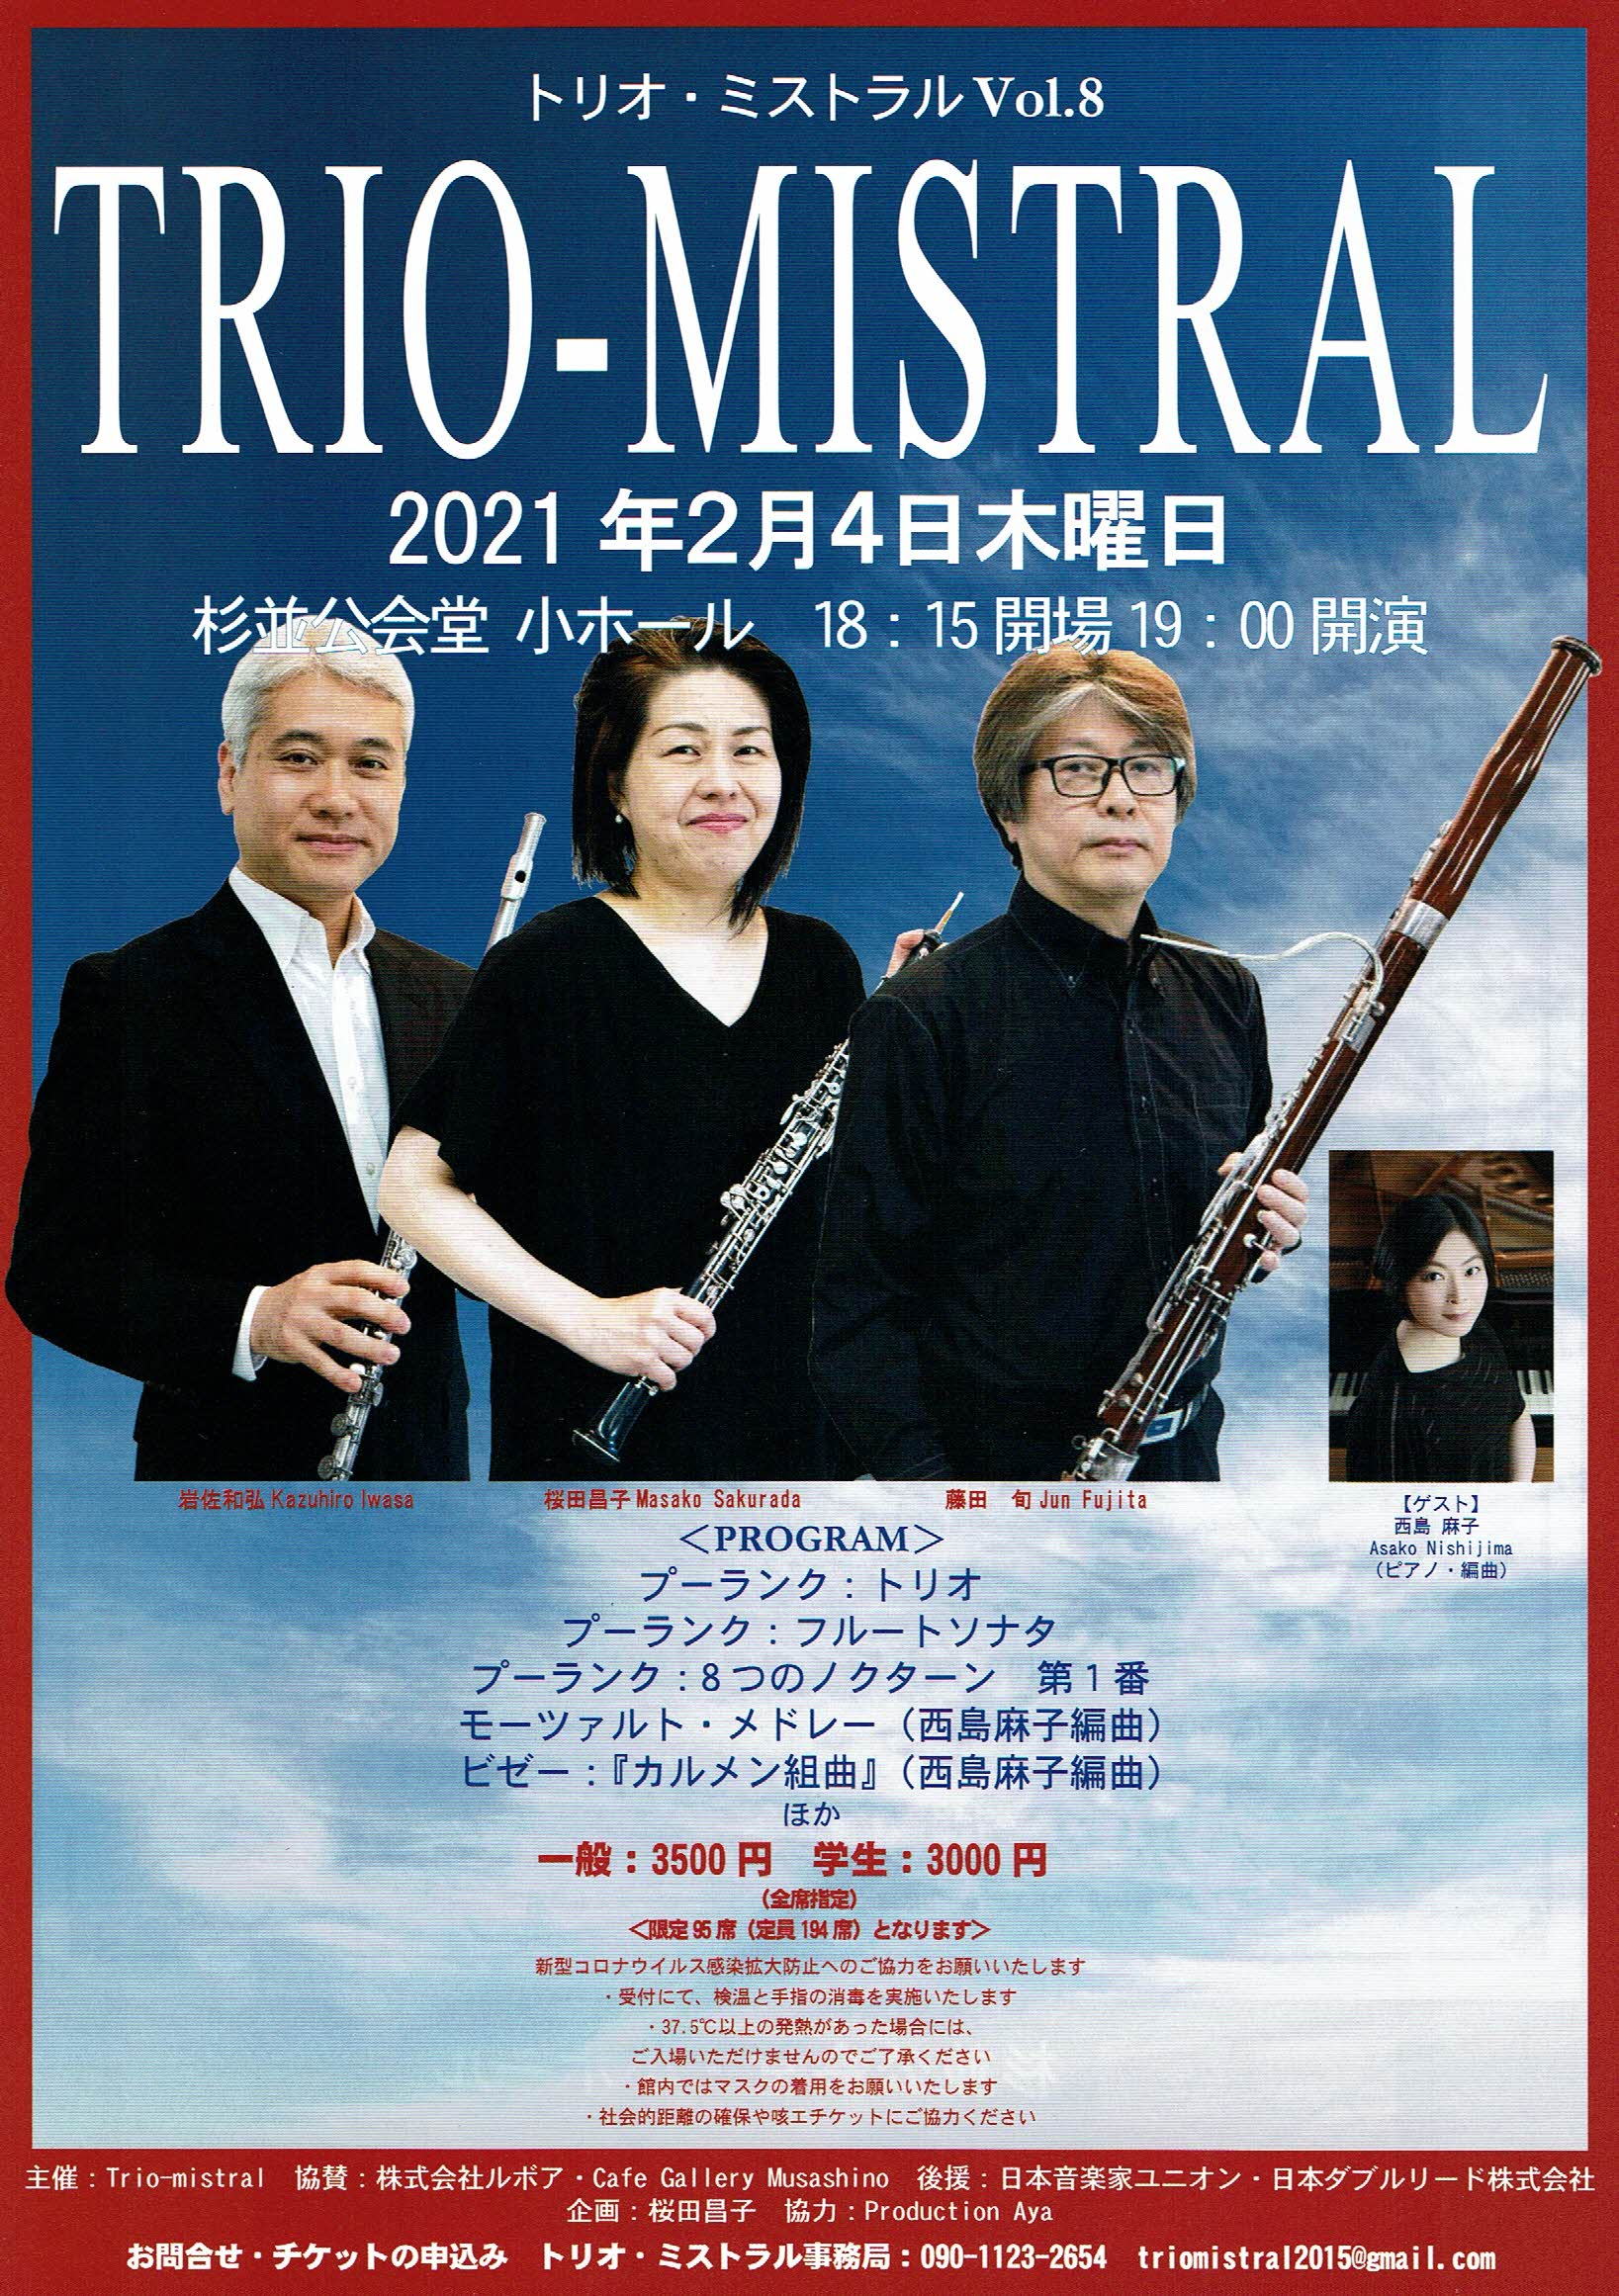 Trio-mistral vol.8